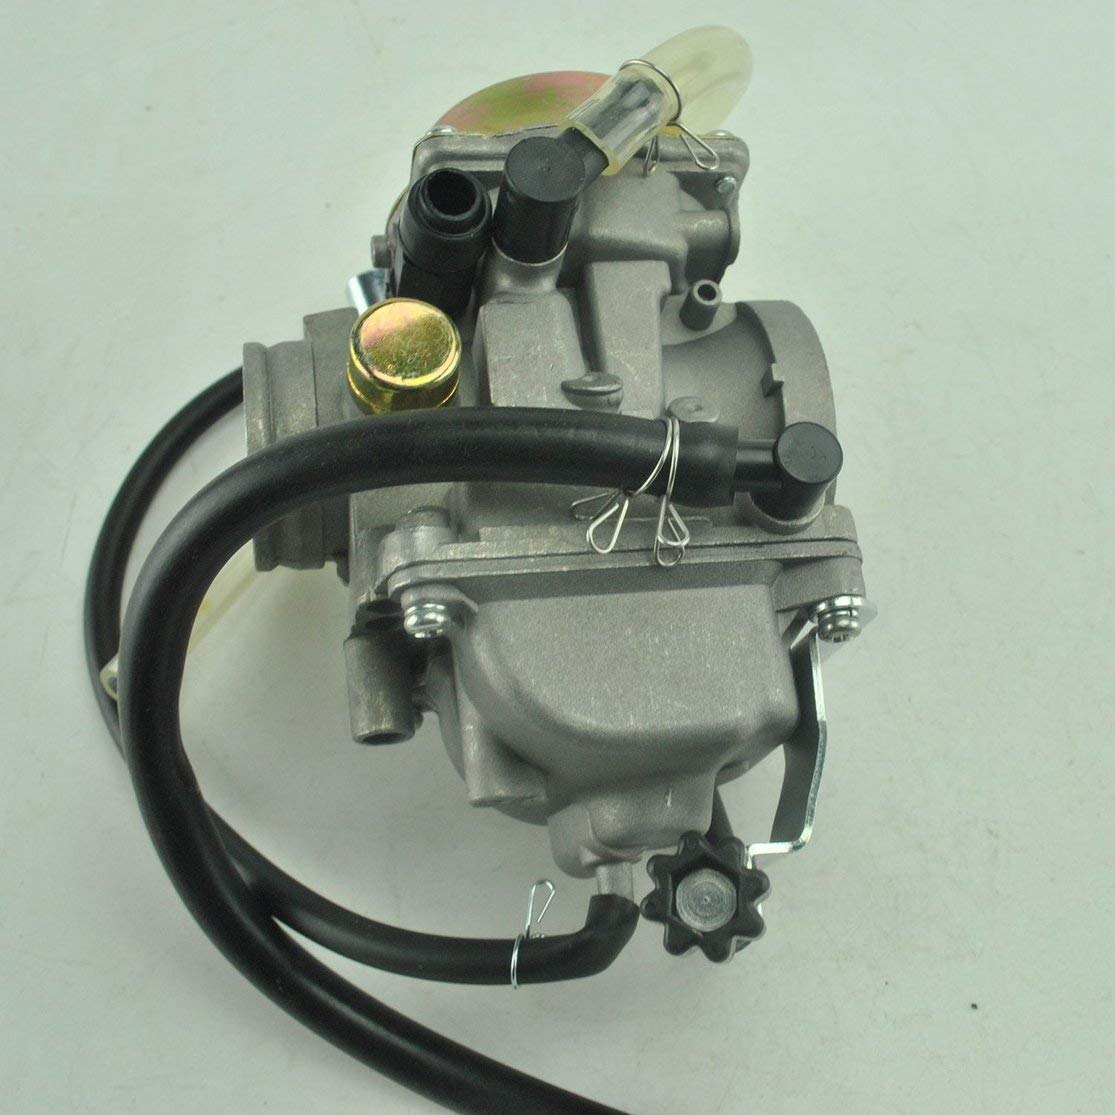 LouiseEvel215 Carburetor compatible for KAWASAKI KLF300 KLF 300 1986-1995 1996-2005 BAYOU Carby Carb ATV